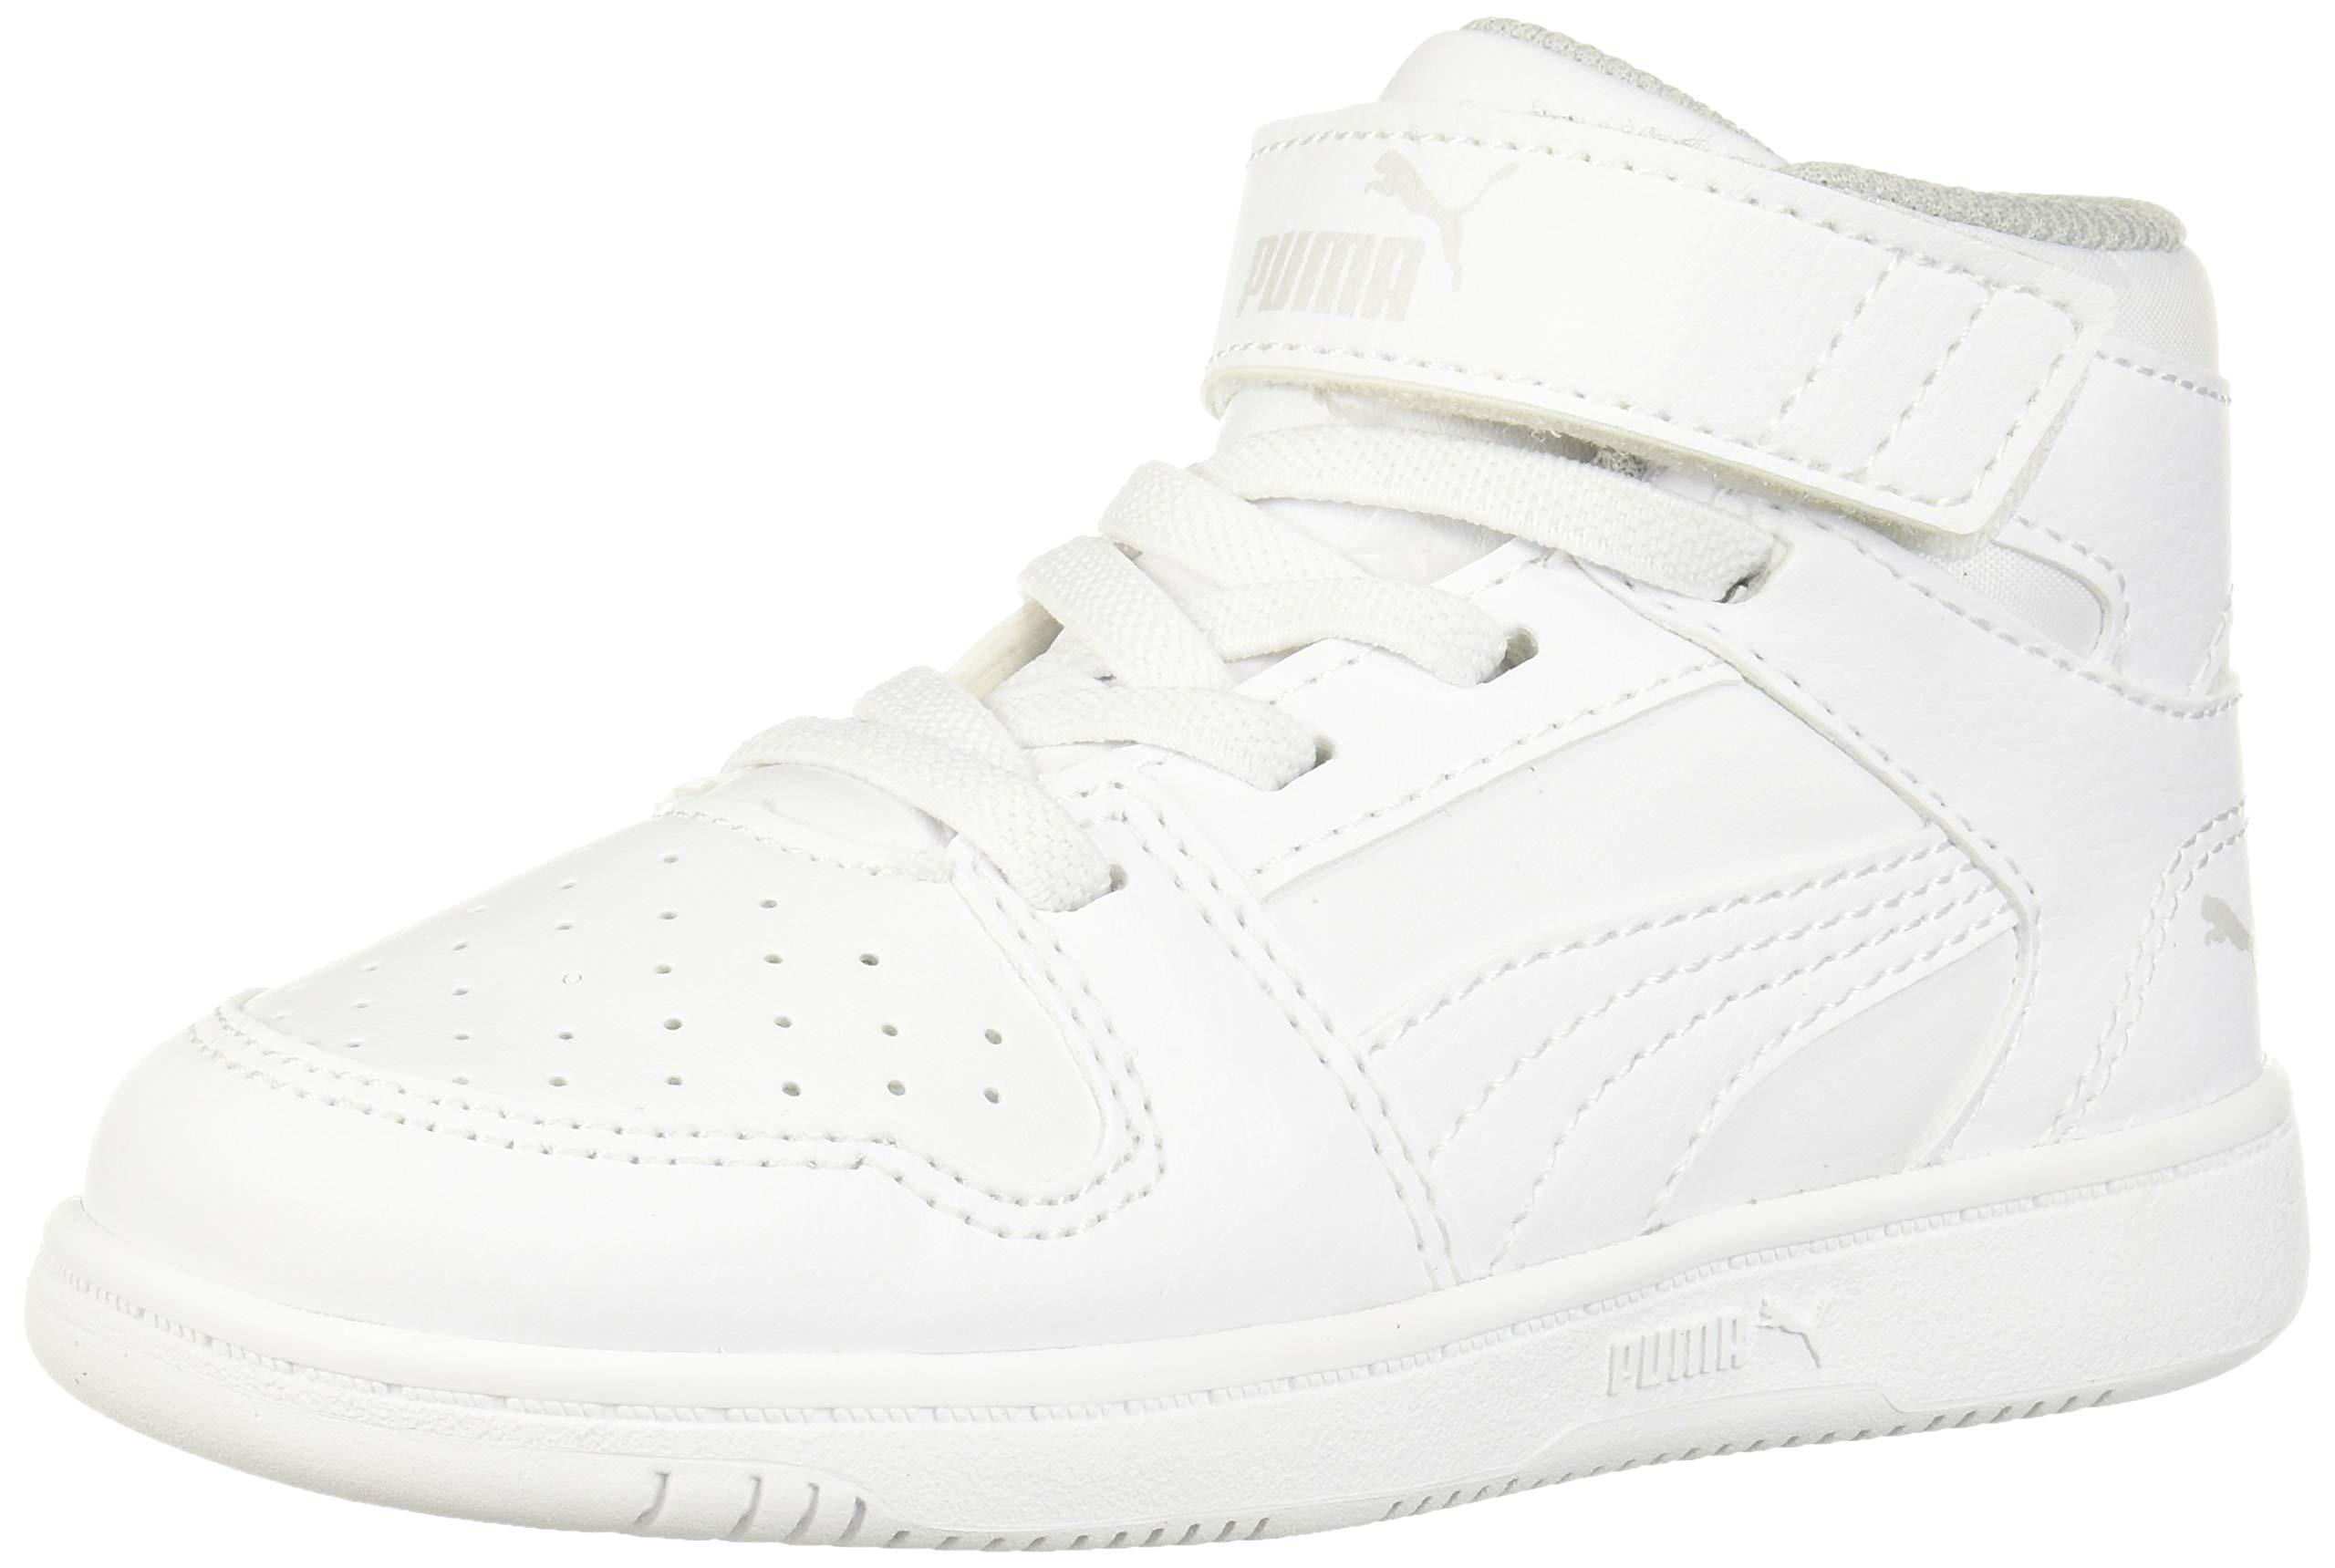 PUMA Baby Rebound Layup Velcro Sneaker, White Black-Gray Violet, 8 M US Toddler by PUMA